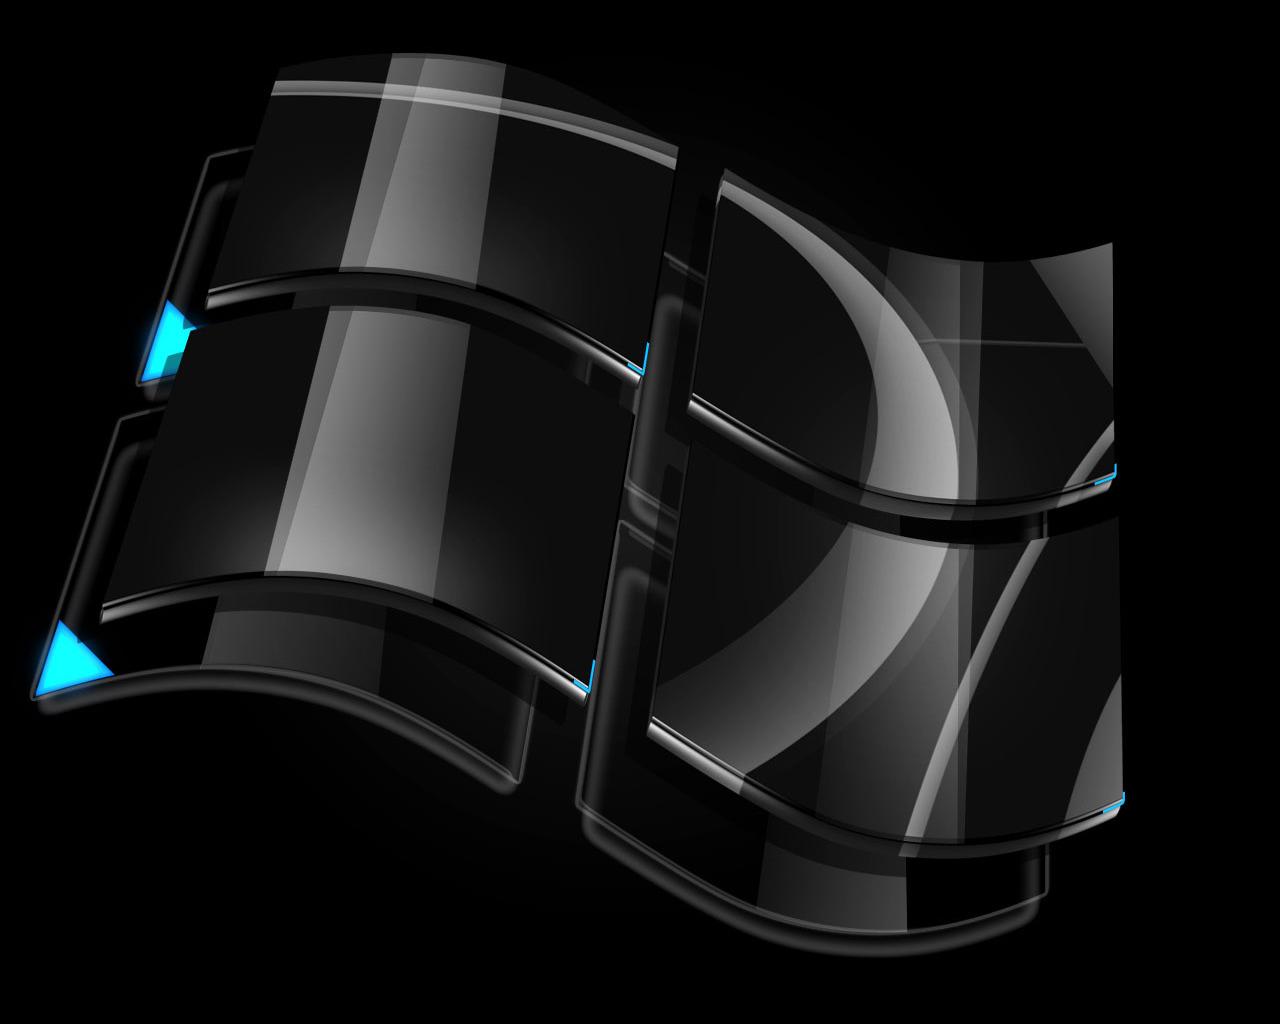 Windows Black Wallpaper 1 Free Hd Wallpaper ...